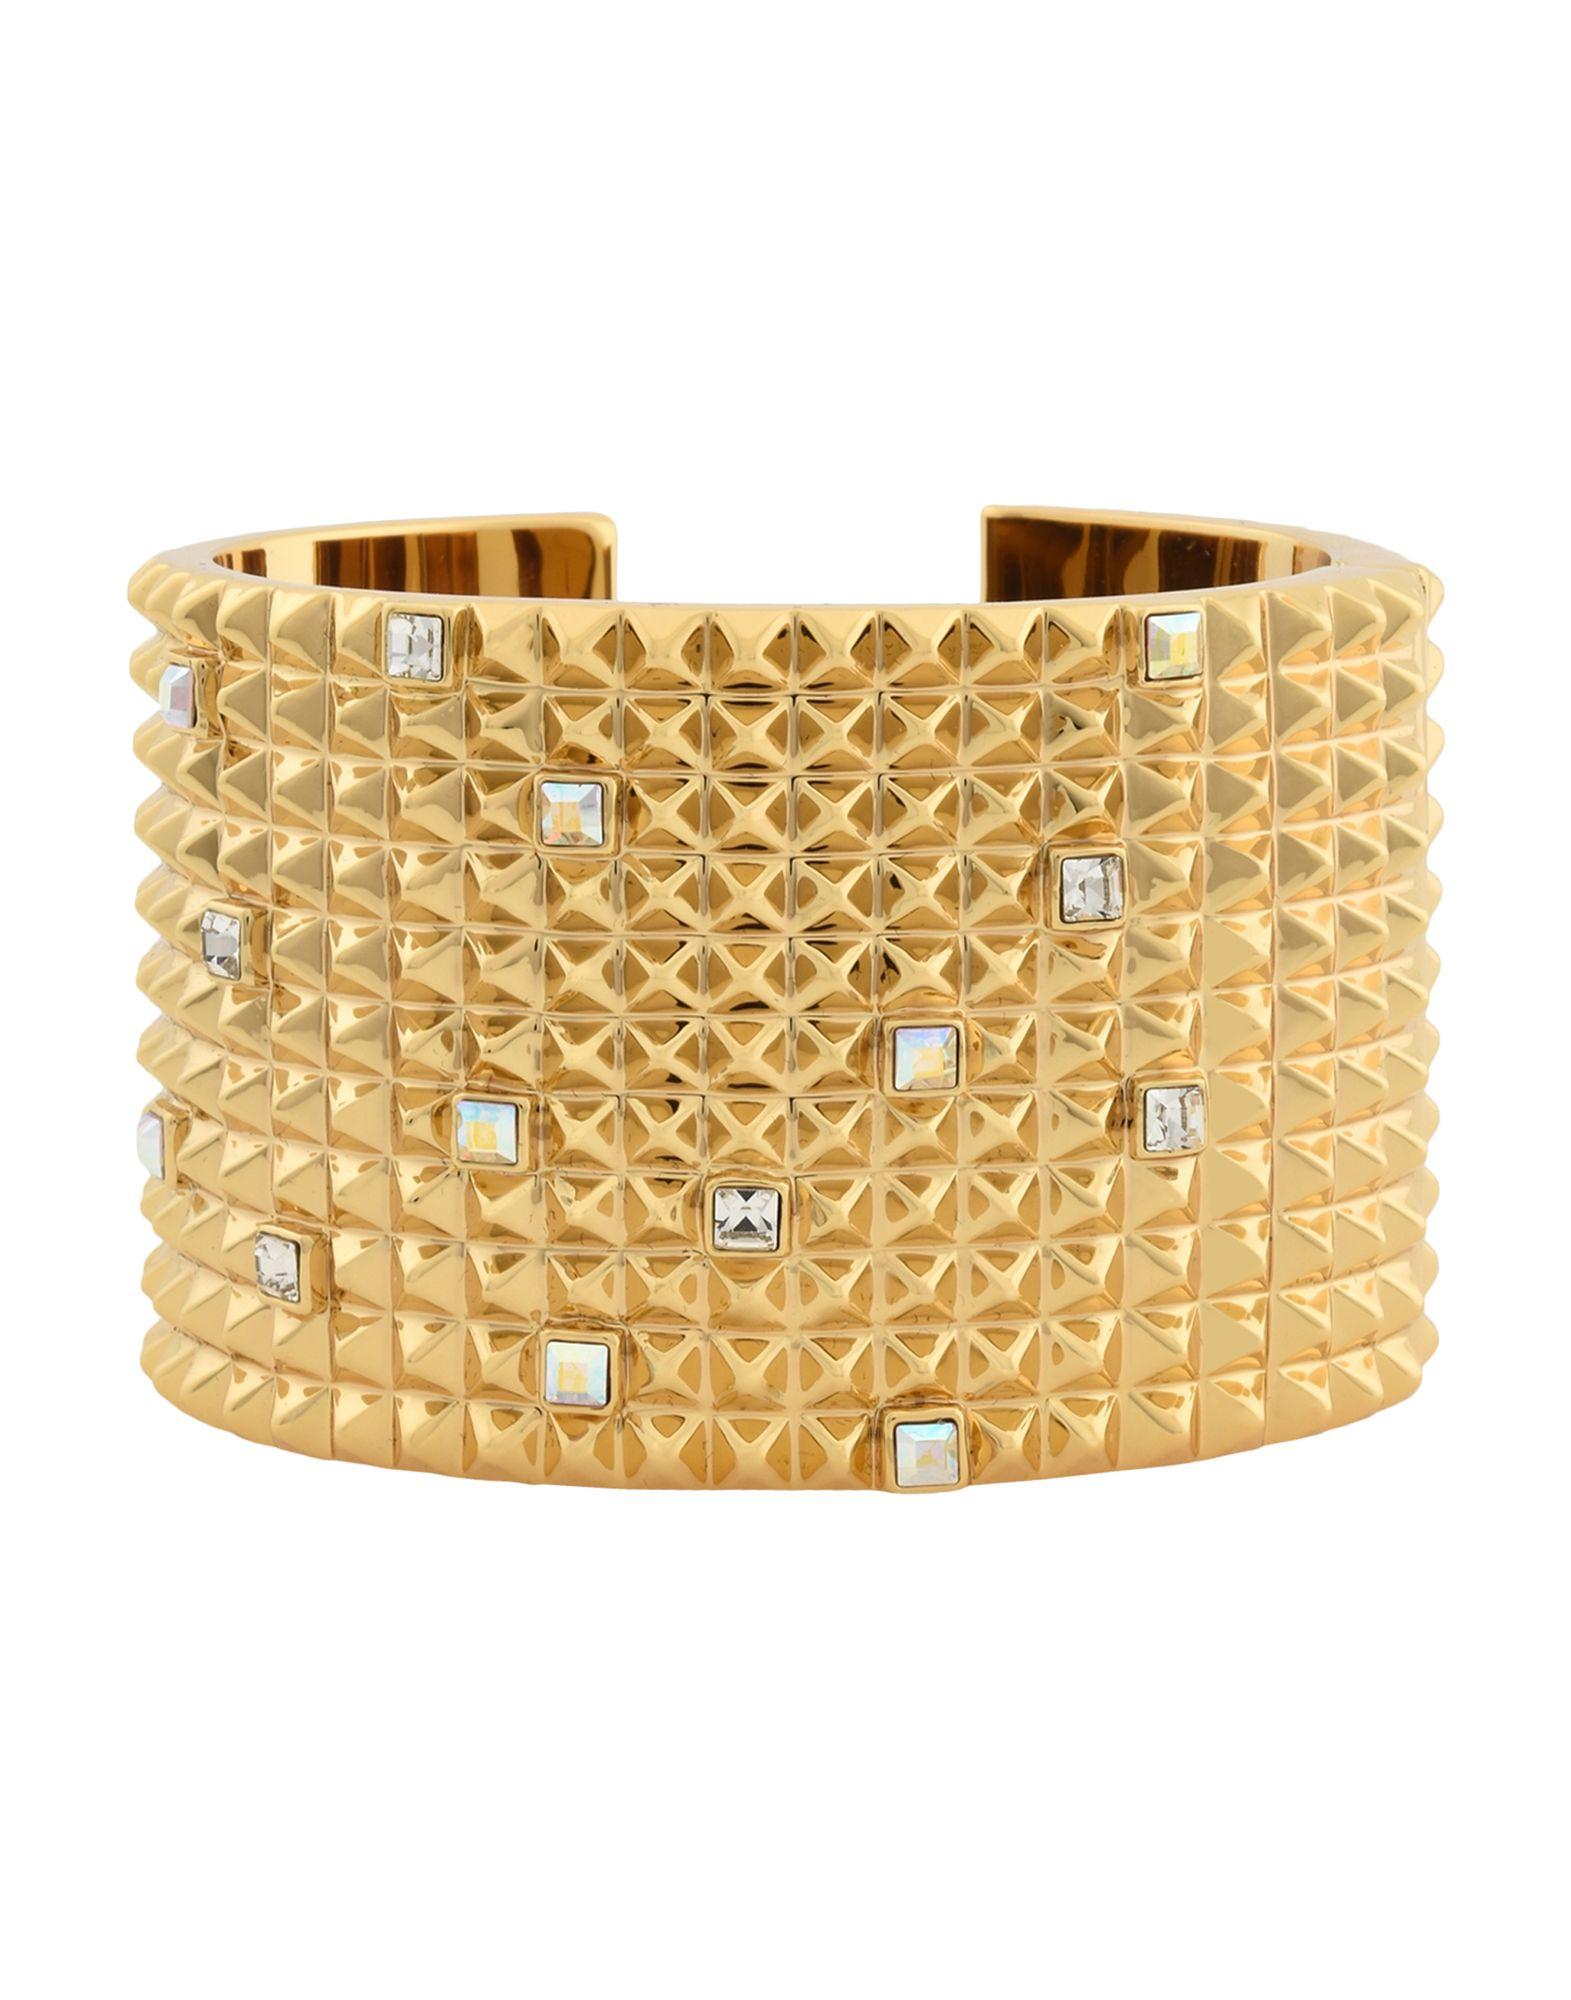 KARL LAGERFELD Bracelets - Item 50226420